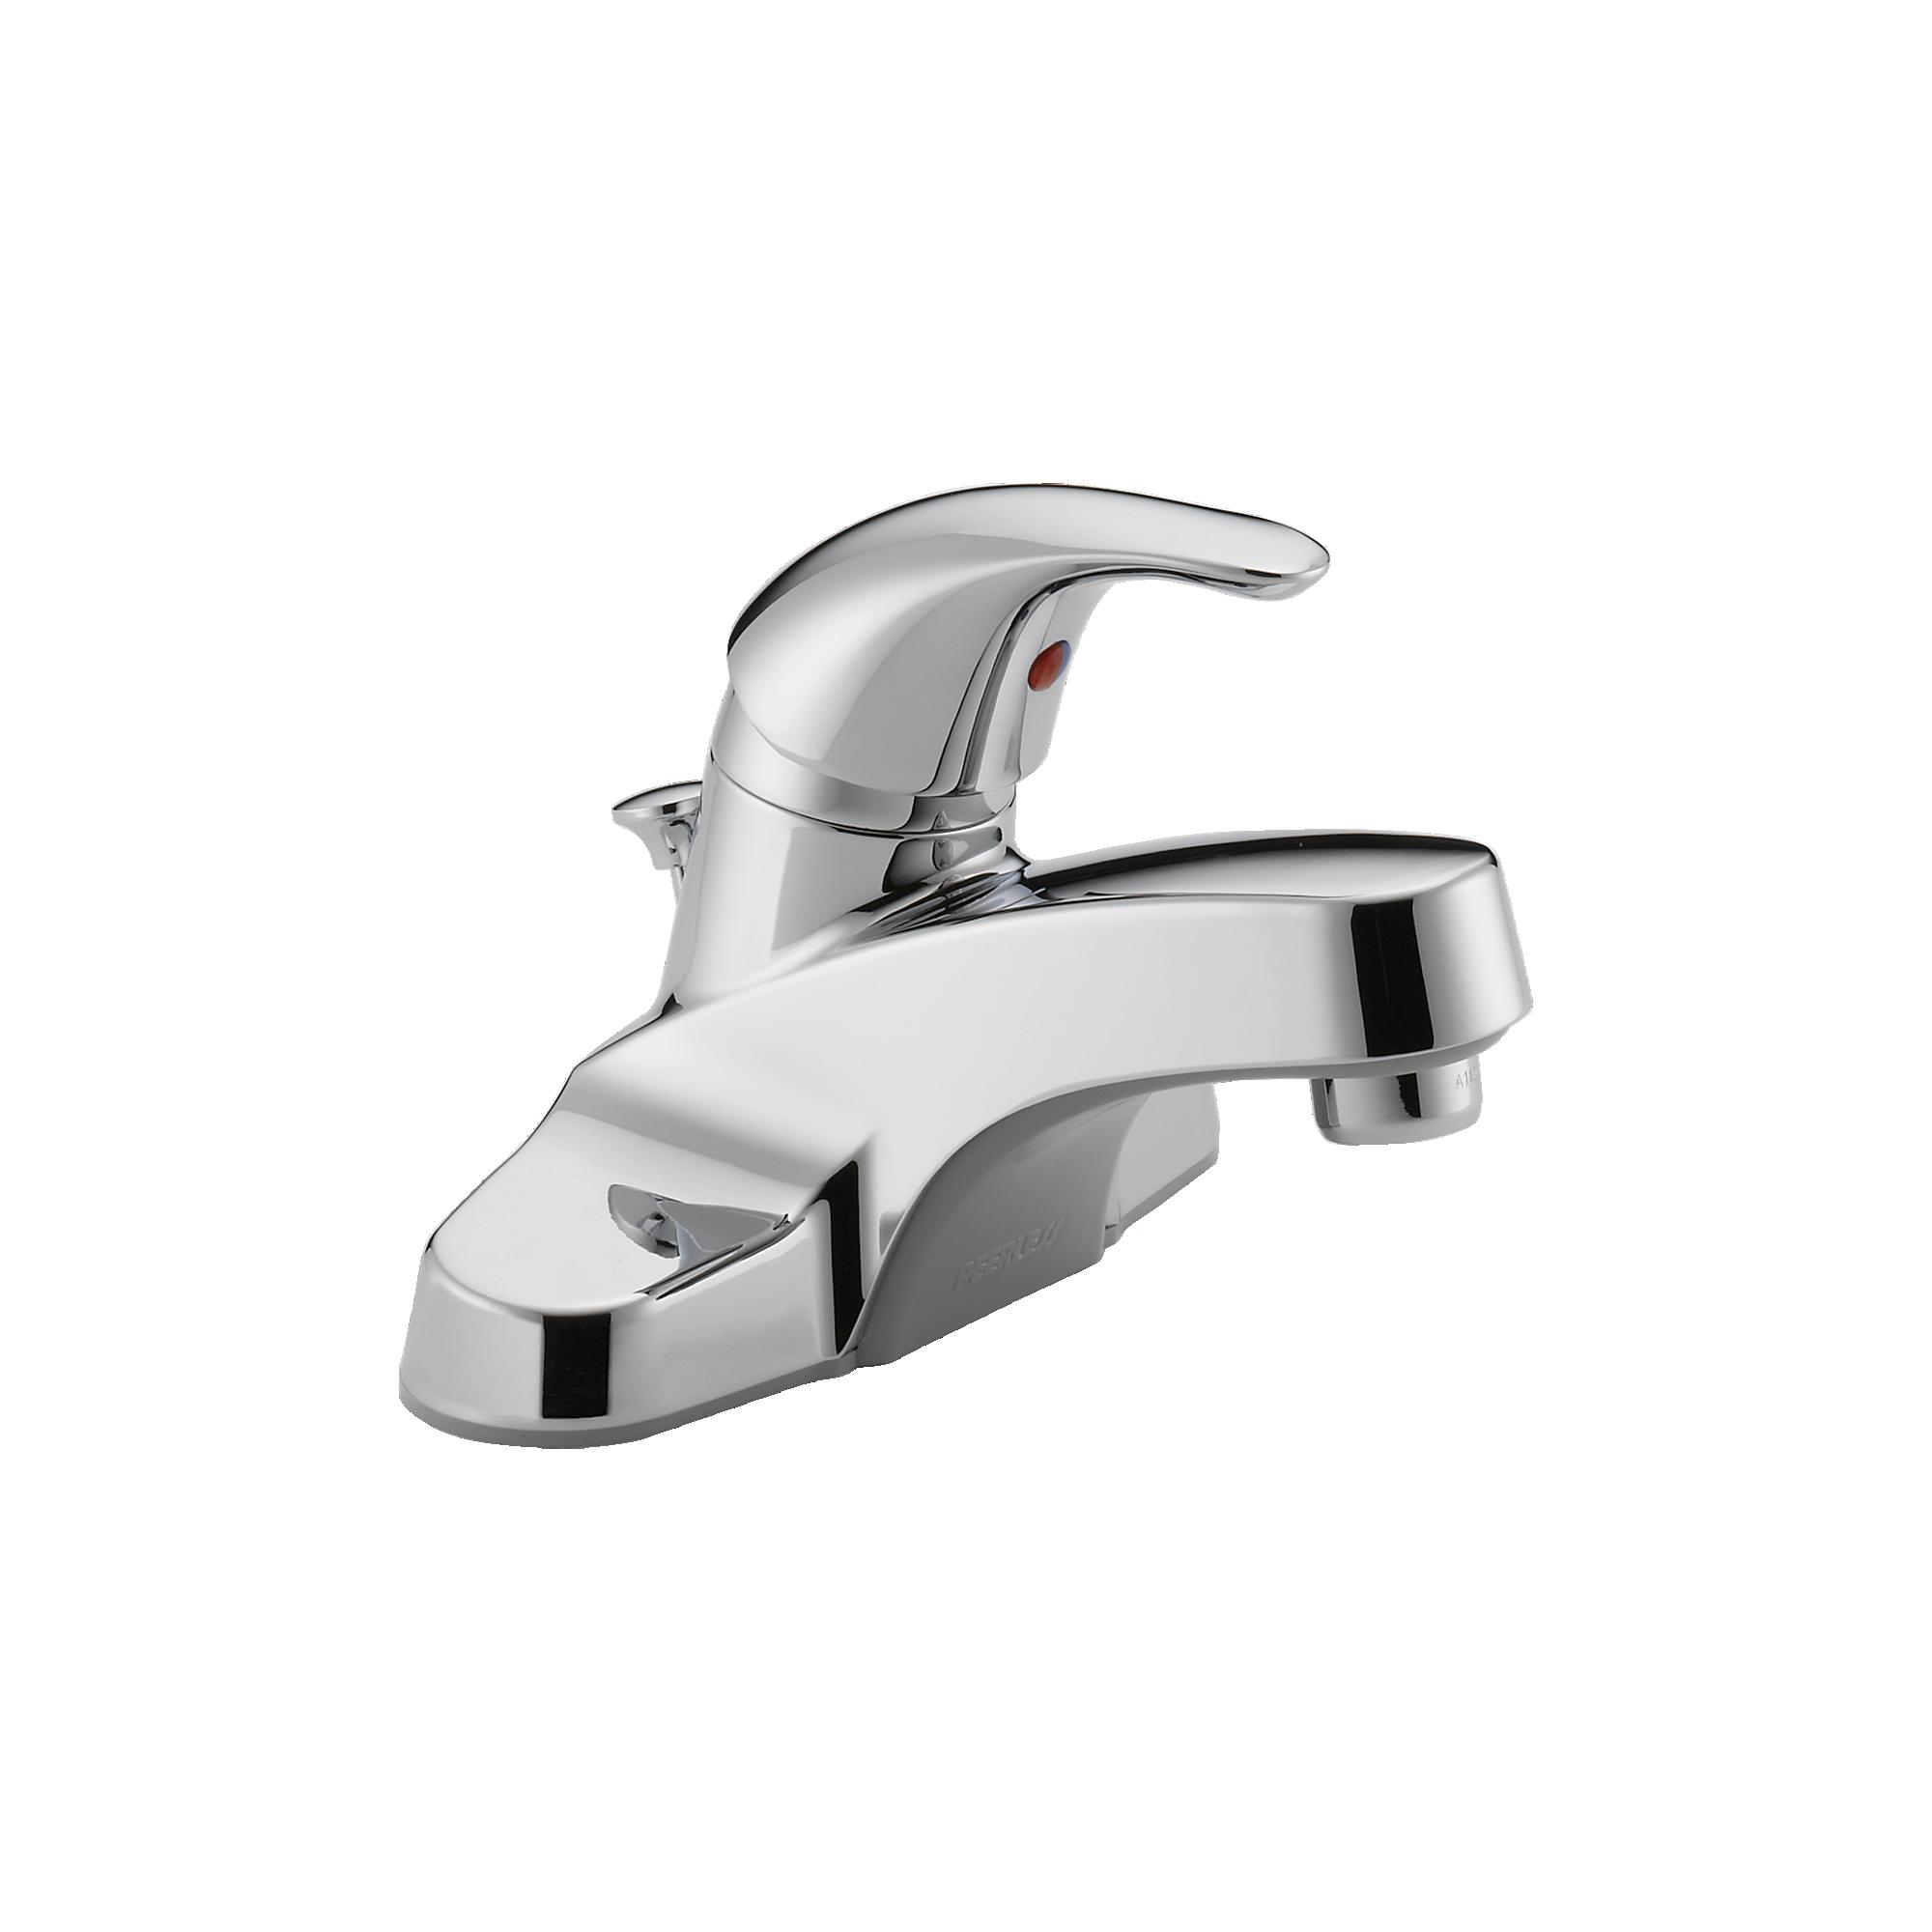 Install bathroom sink faucet - Diy Bathroom Faucet Replacement Monclerfactoryoutletscom Install Bathroom Faucet